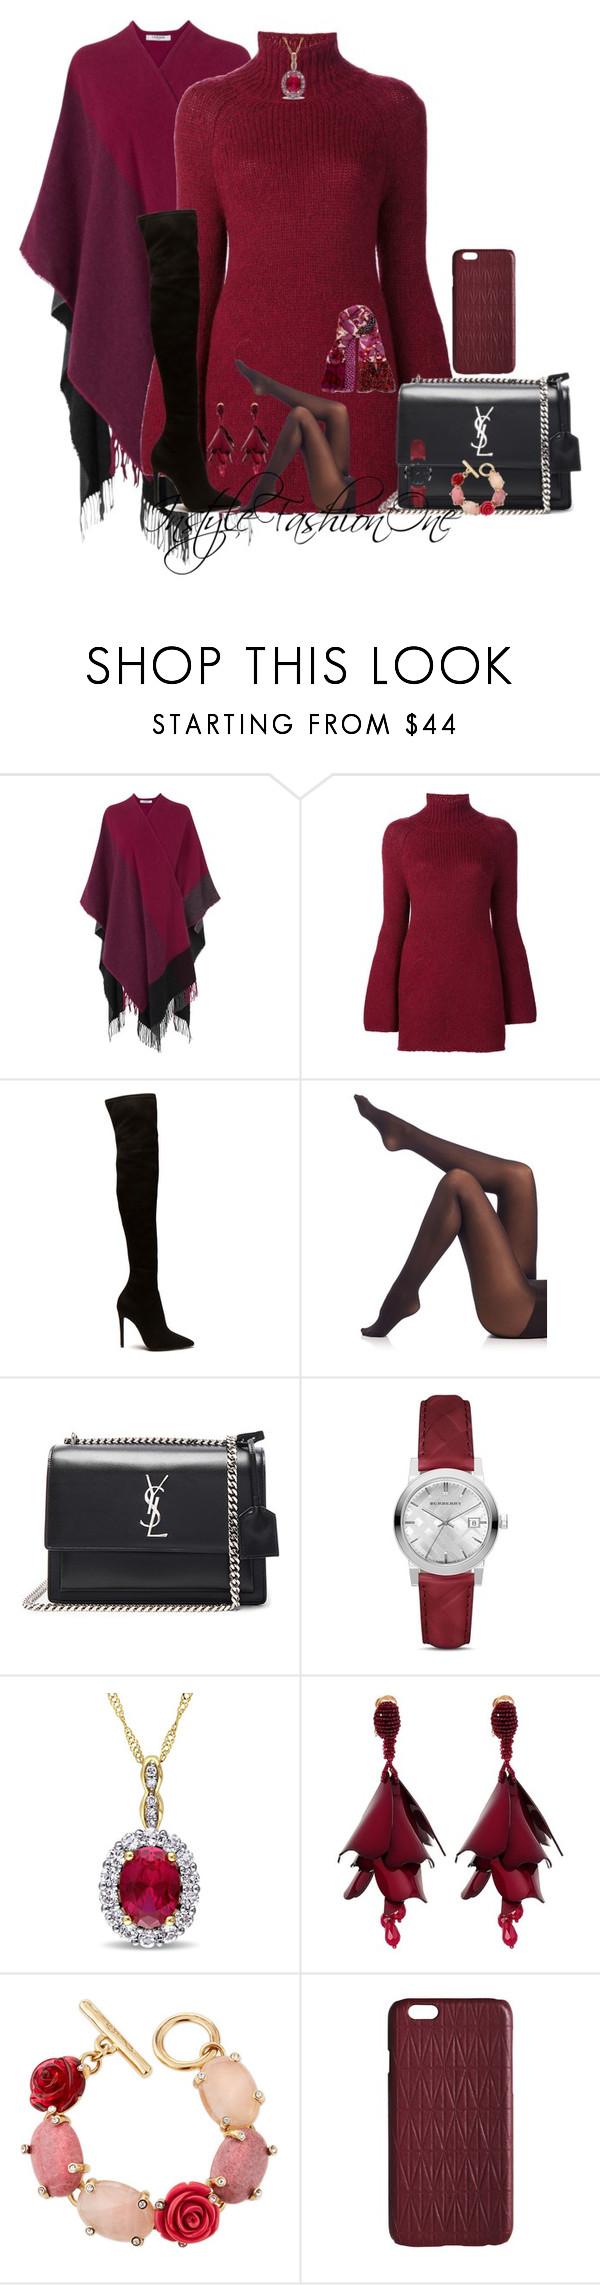 """HNUY"" by stylish1475 ❤ liked on Polyvore featuring L.K.Bennett, Rosetta Getty, SPANX, Yves Saint Laurent, Burberry, Oscar de la Renta, Dagmar and Diane Von Furstenberg"